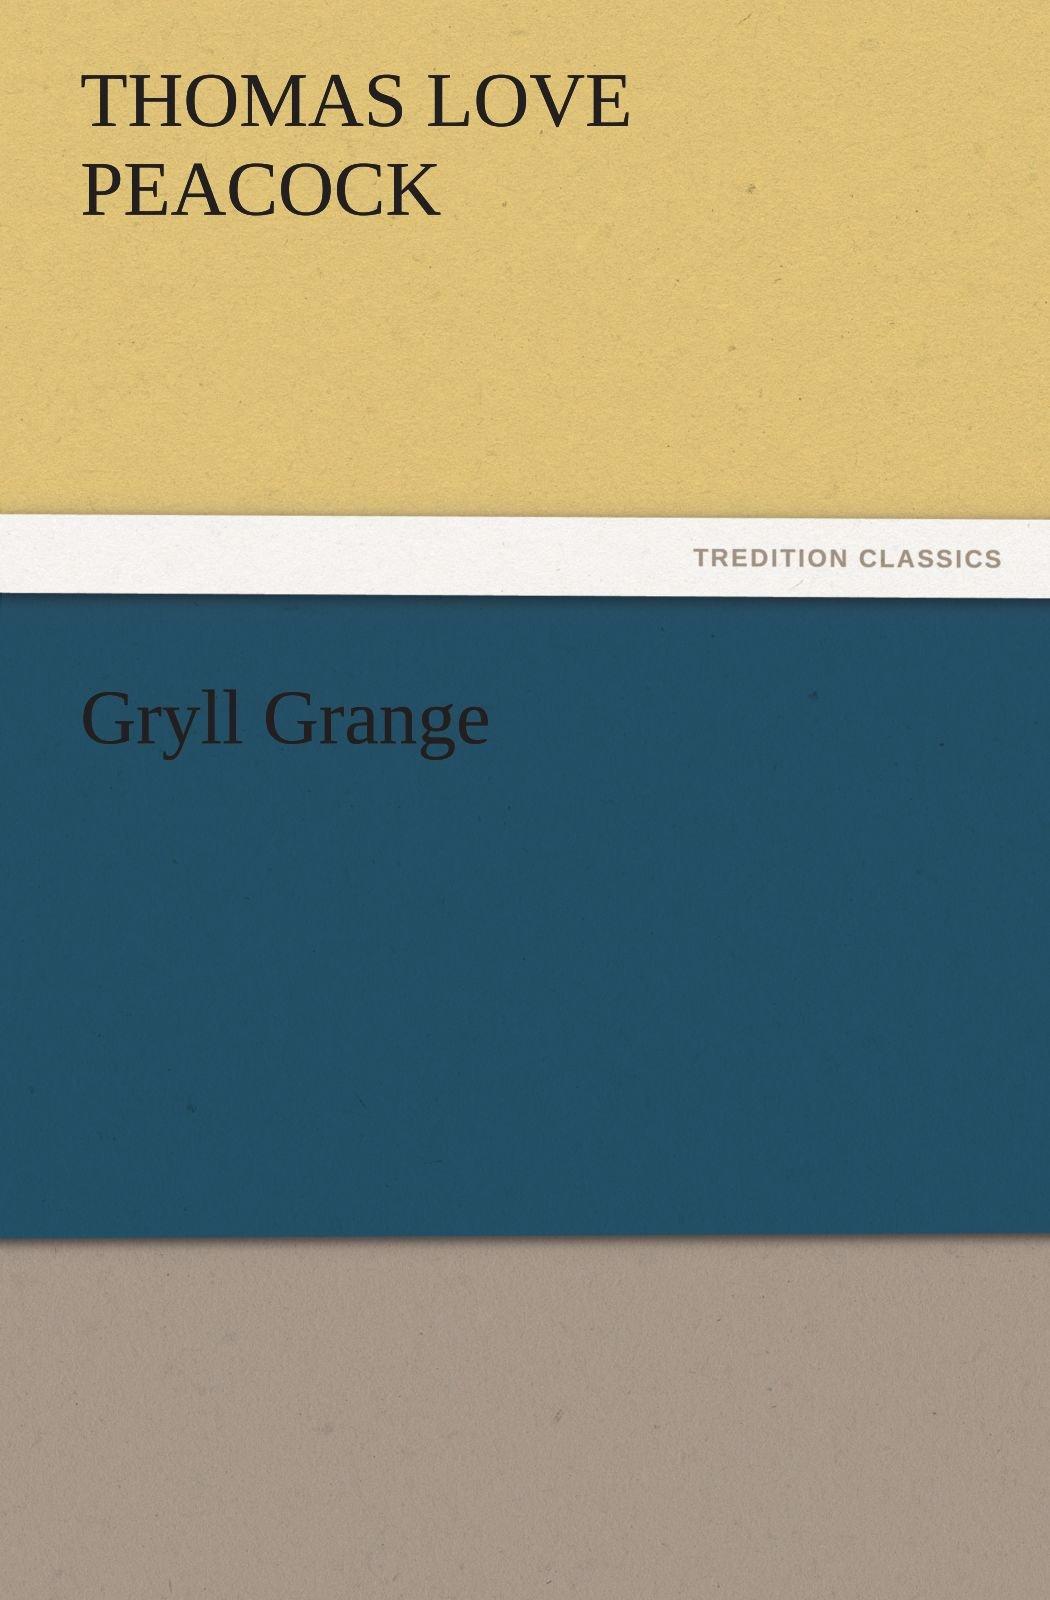 Download Gryll Grange (TREDITION CLASSICS) PDF